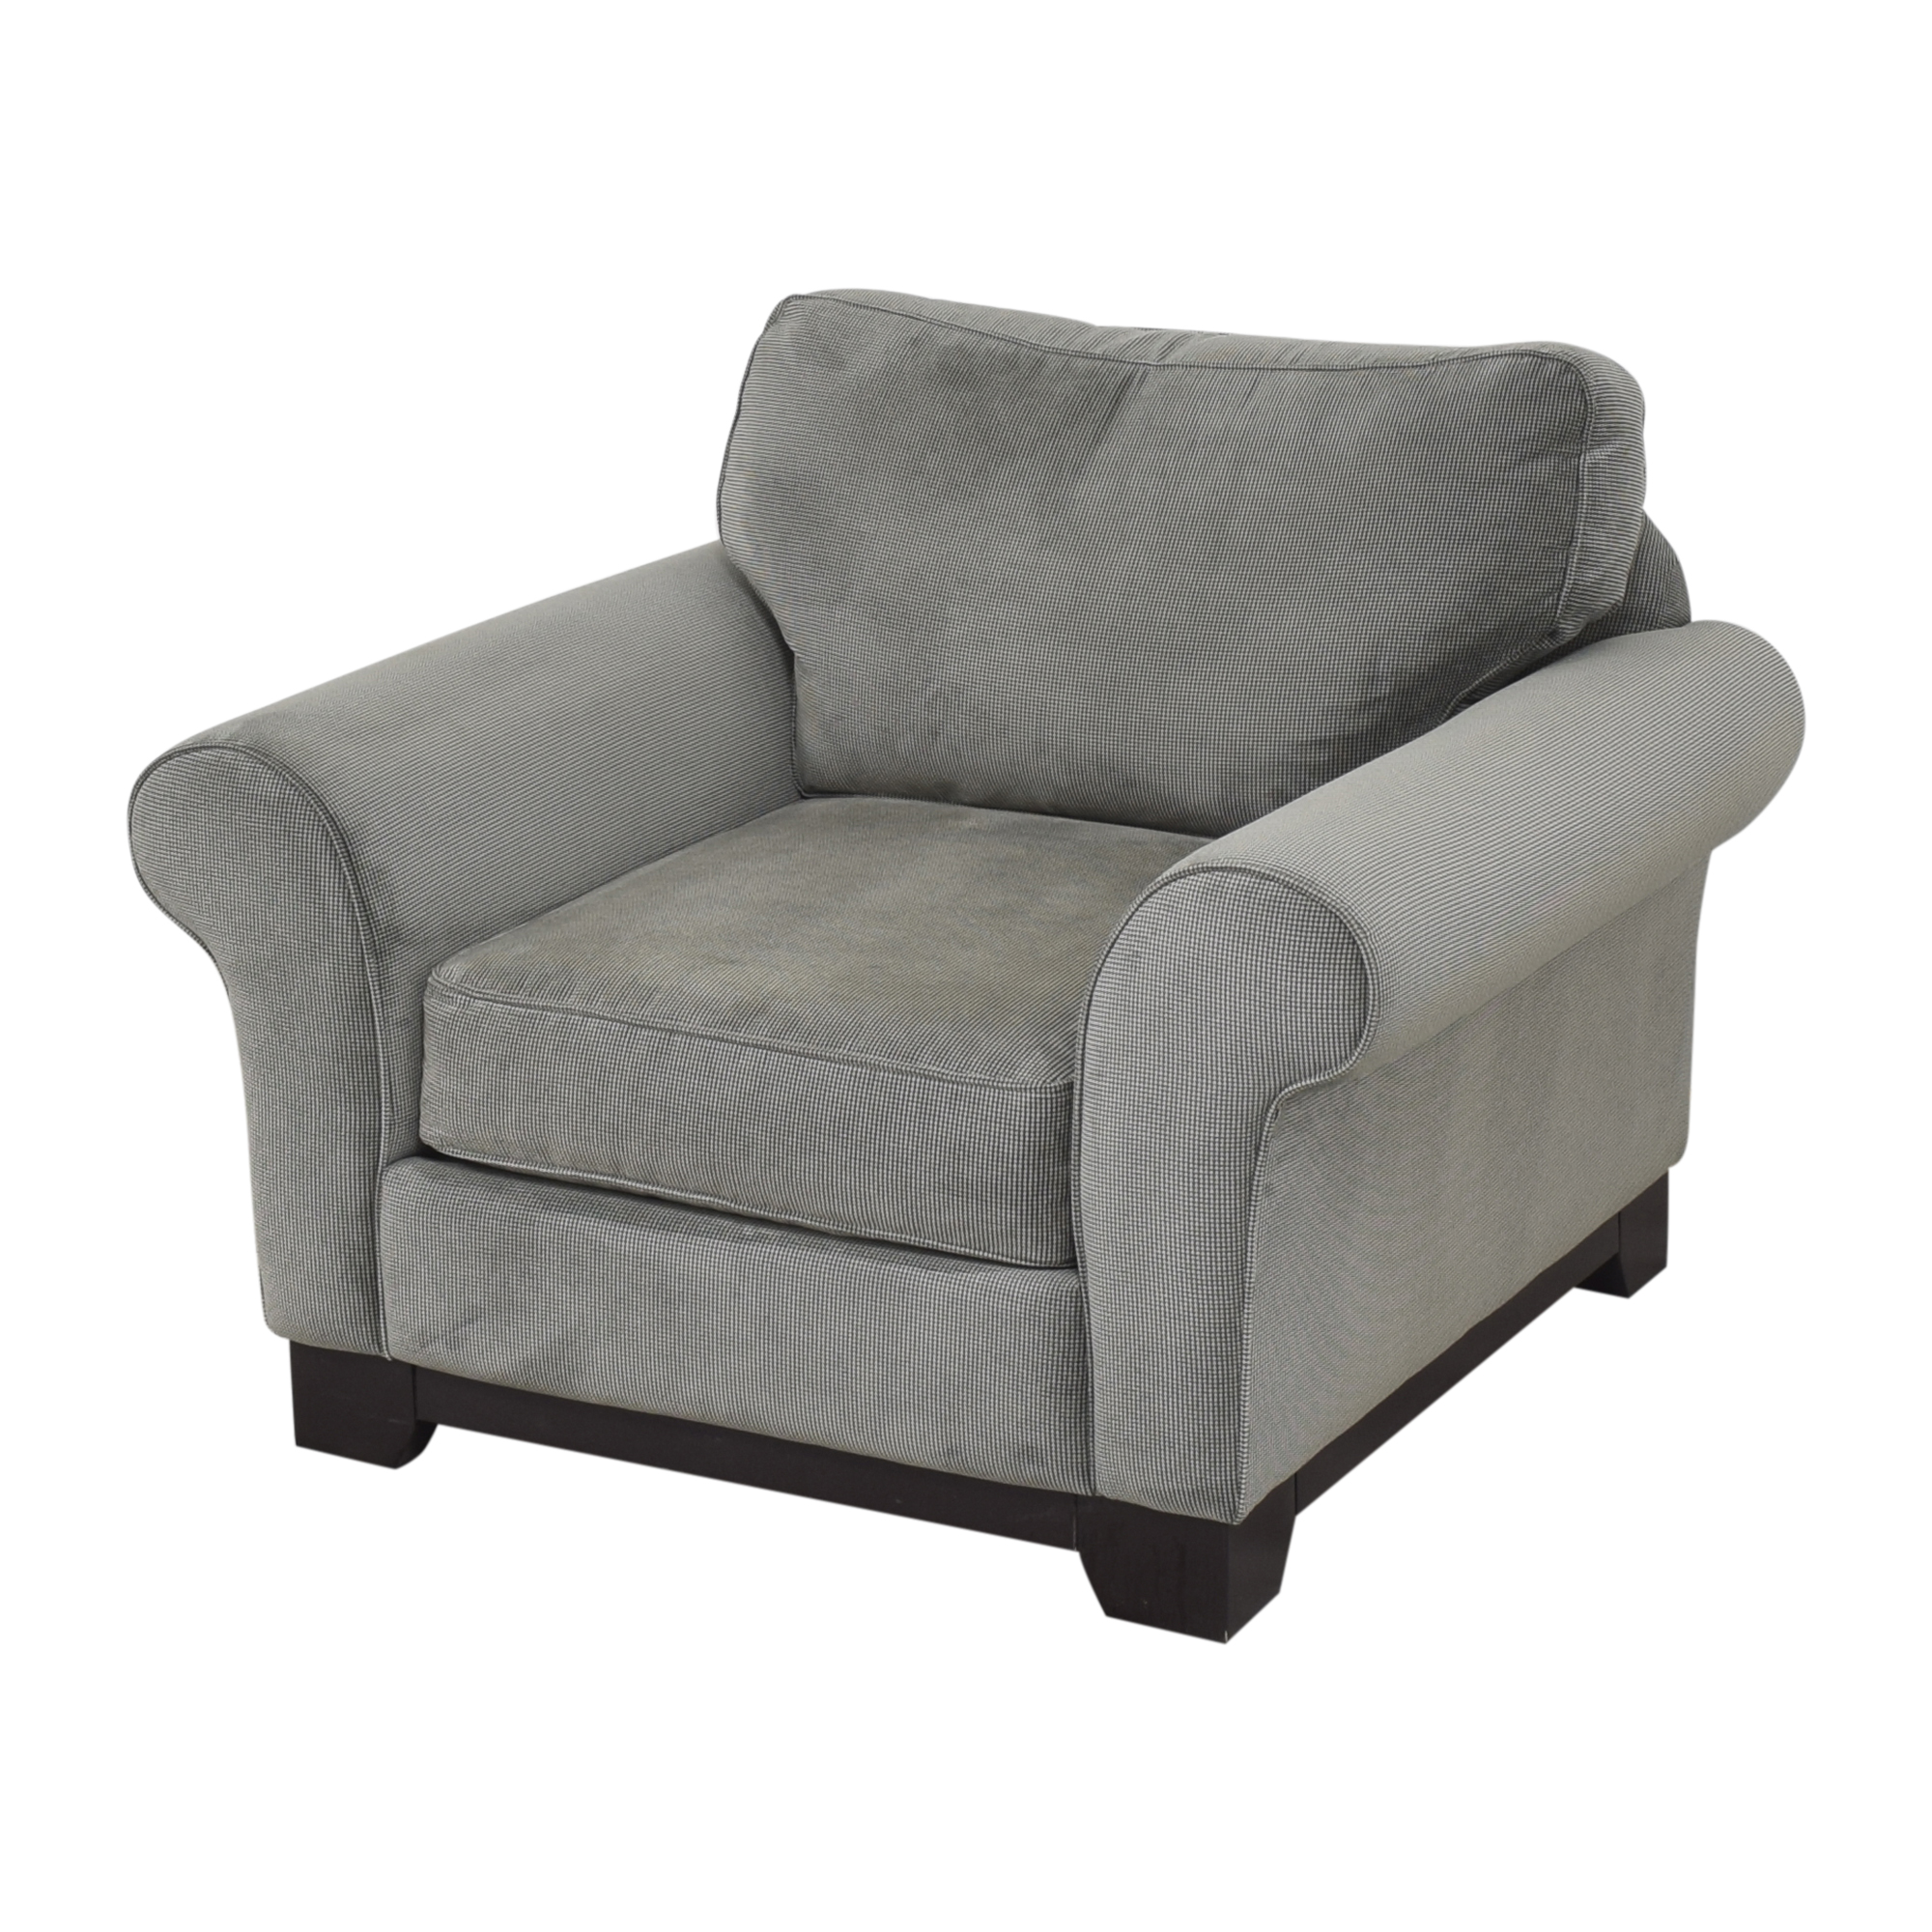 buy Macy's Medland Armchair with Ottoman Macy's